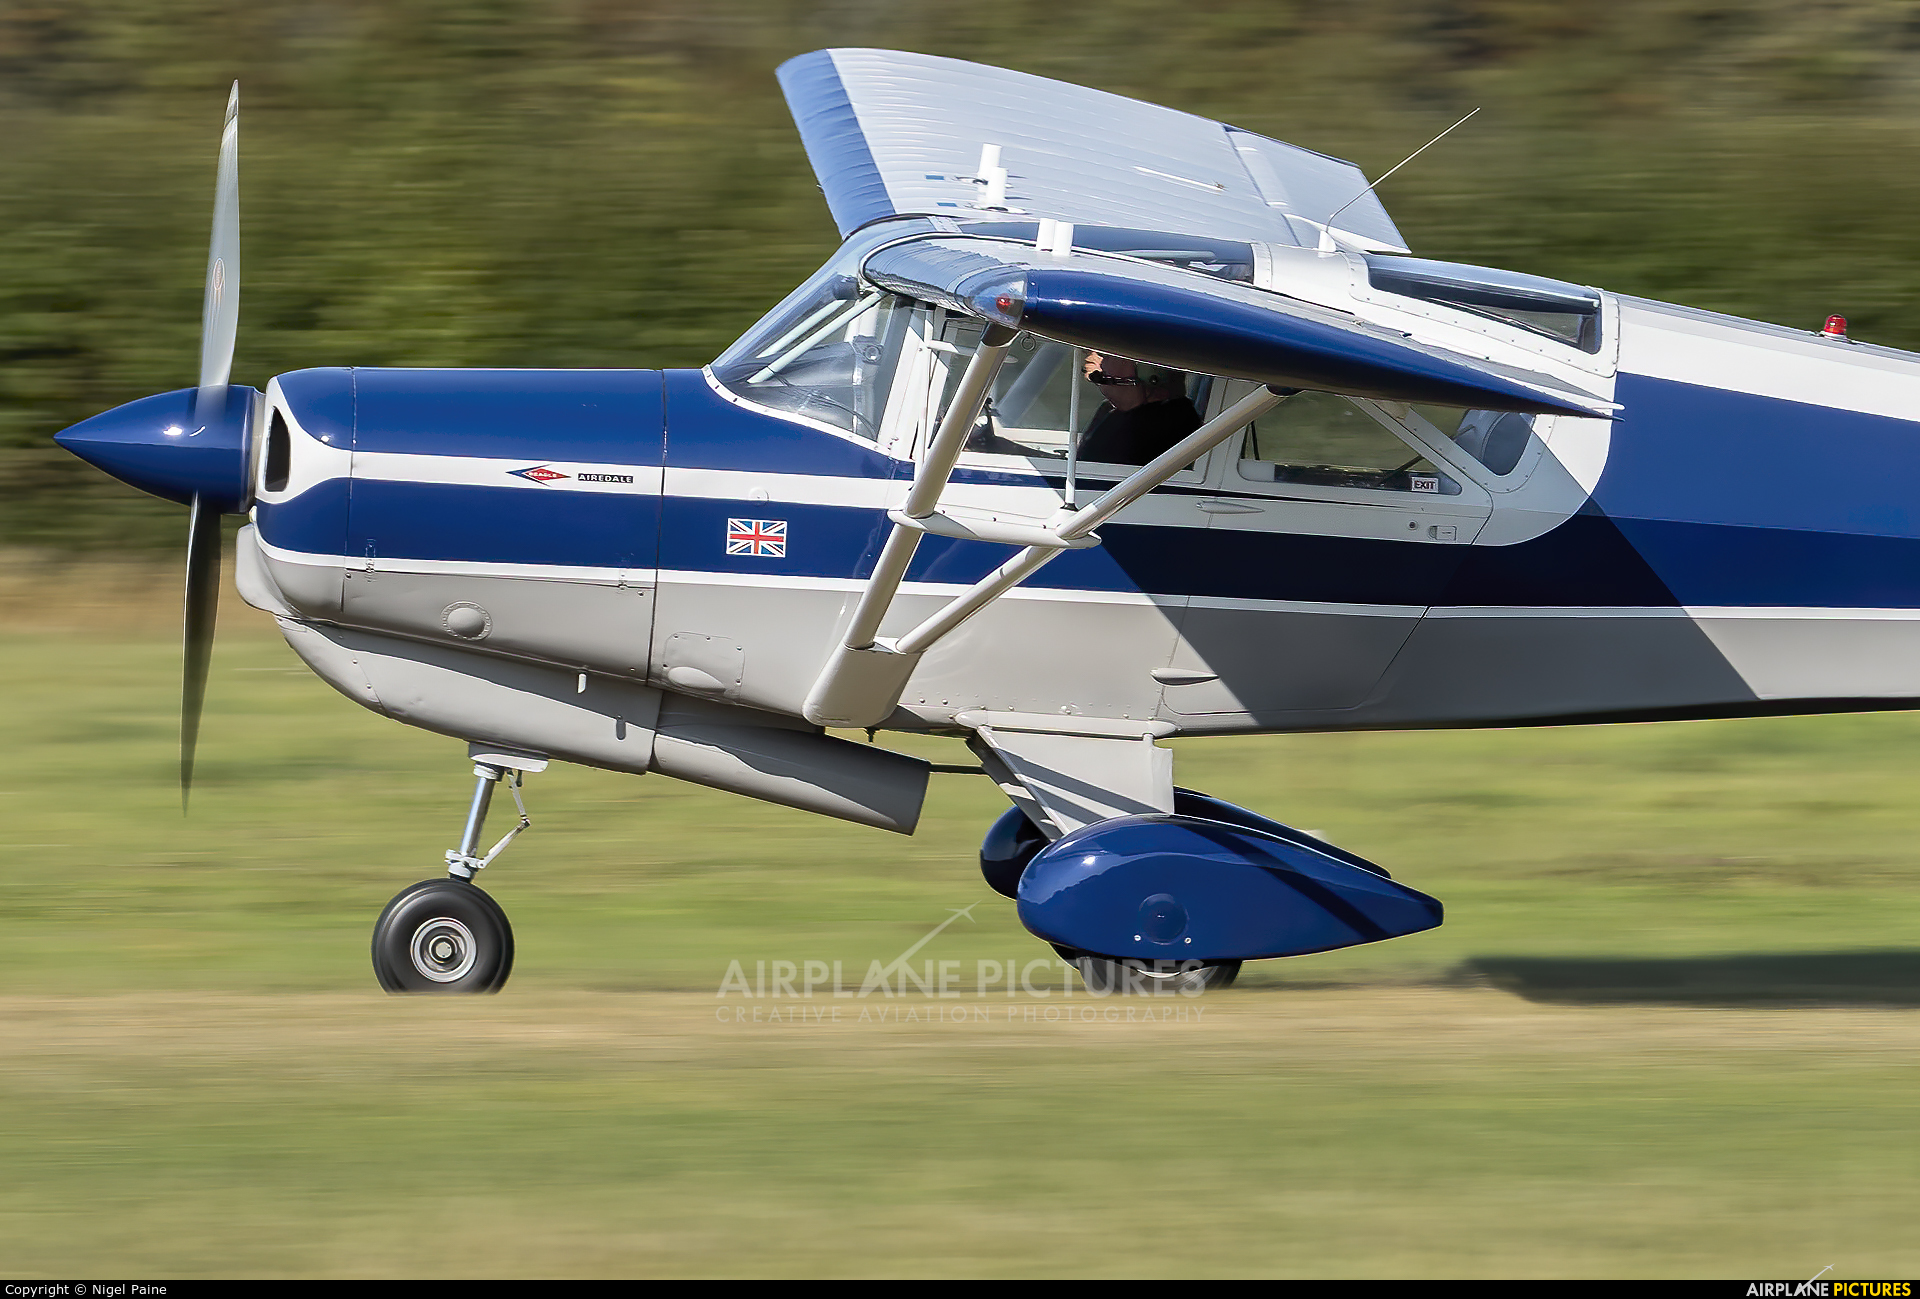 Private G-ASRK aircraft at Lashenden / Headcorn